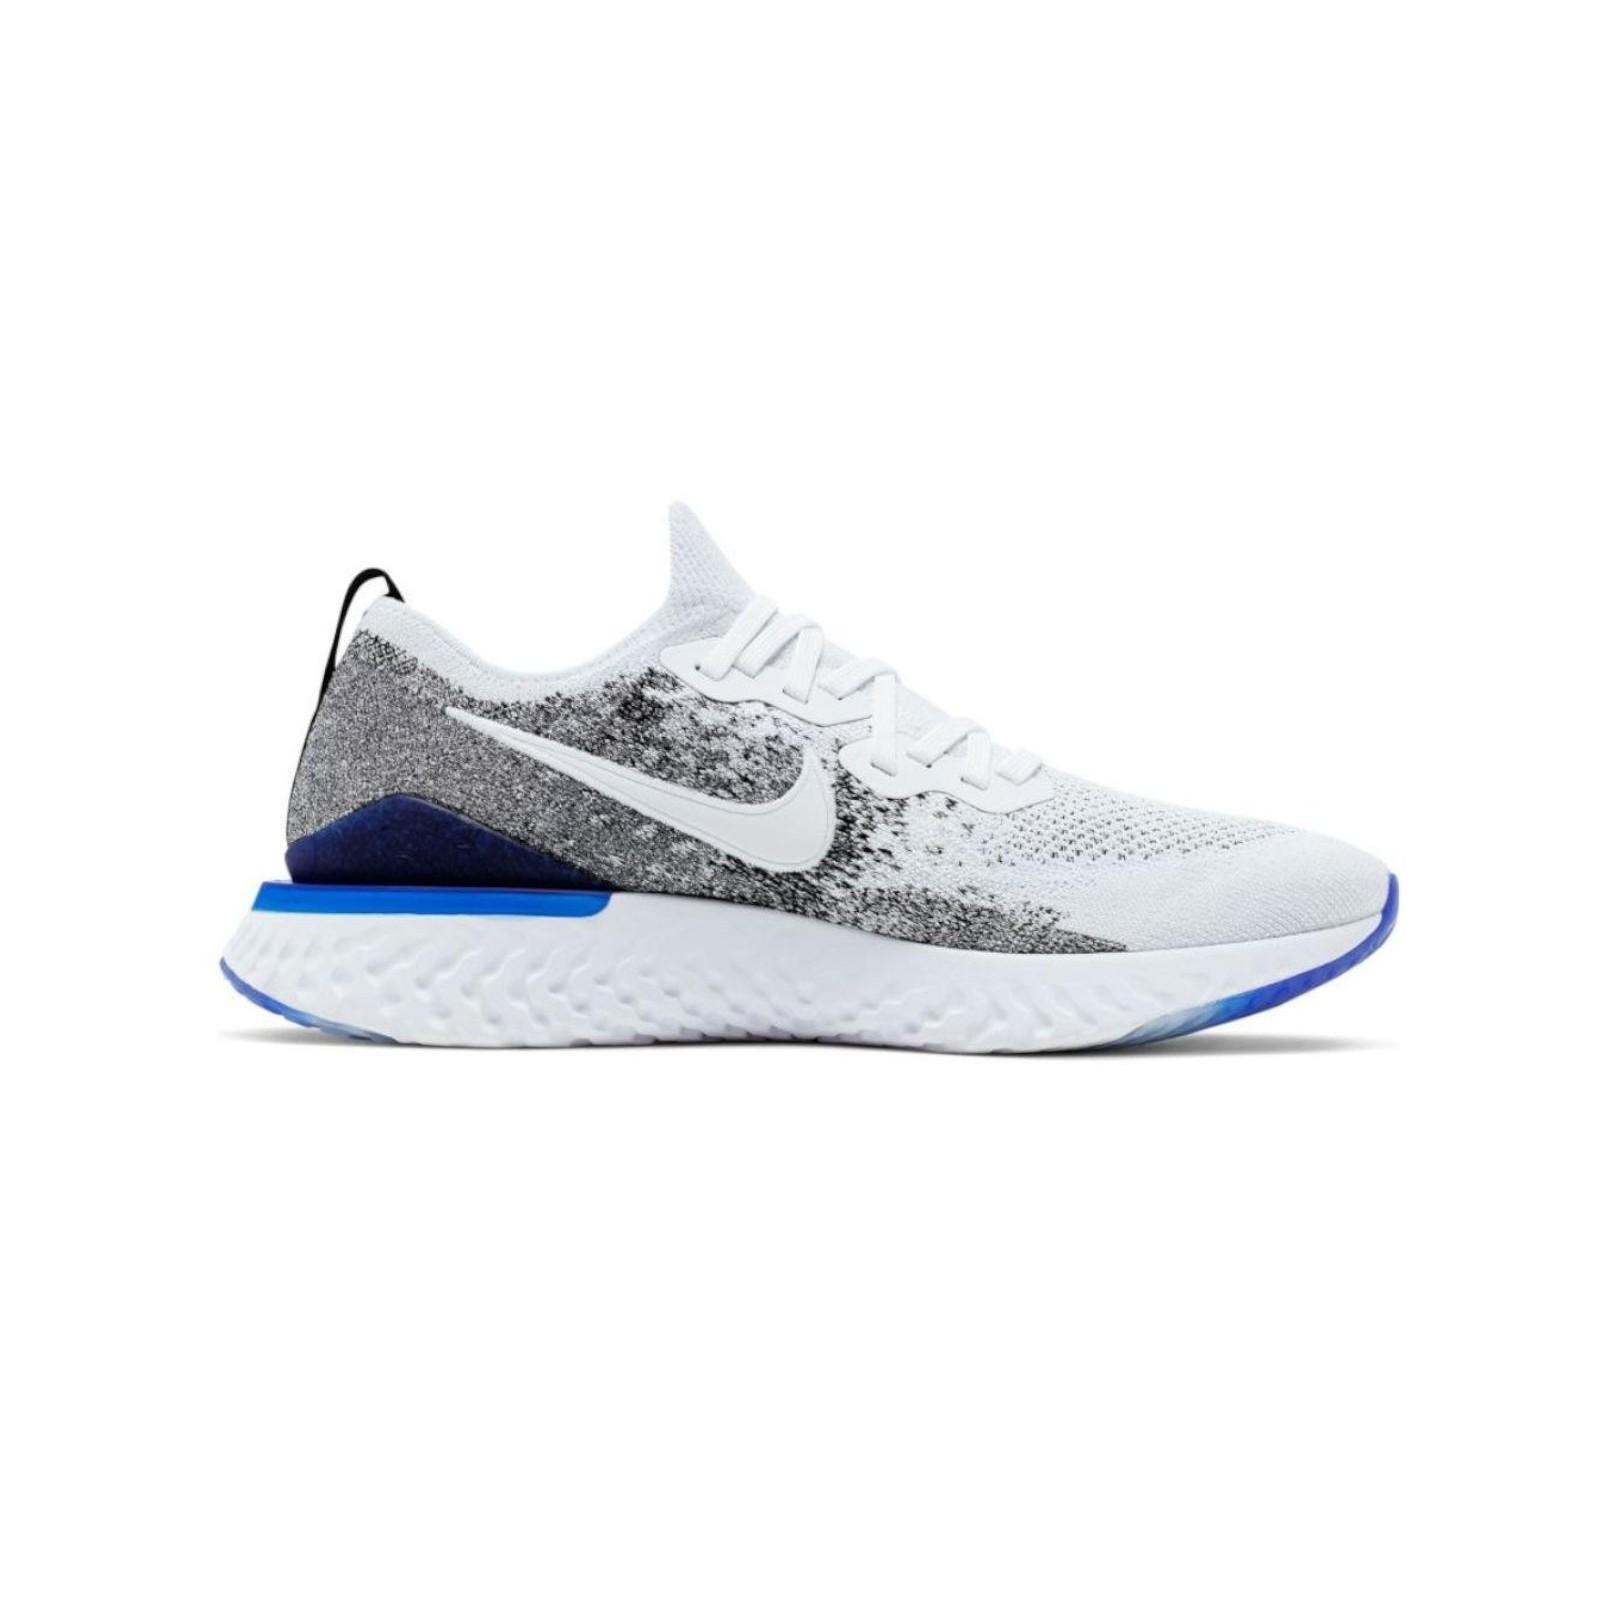 reflujo Talla romántico  Nike EPIC REACT FLYKNIT 2 NIKBQ8928102